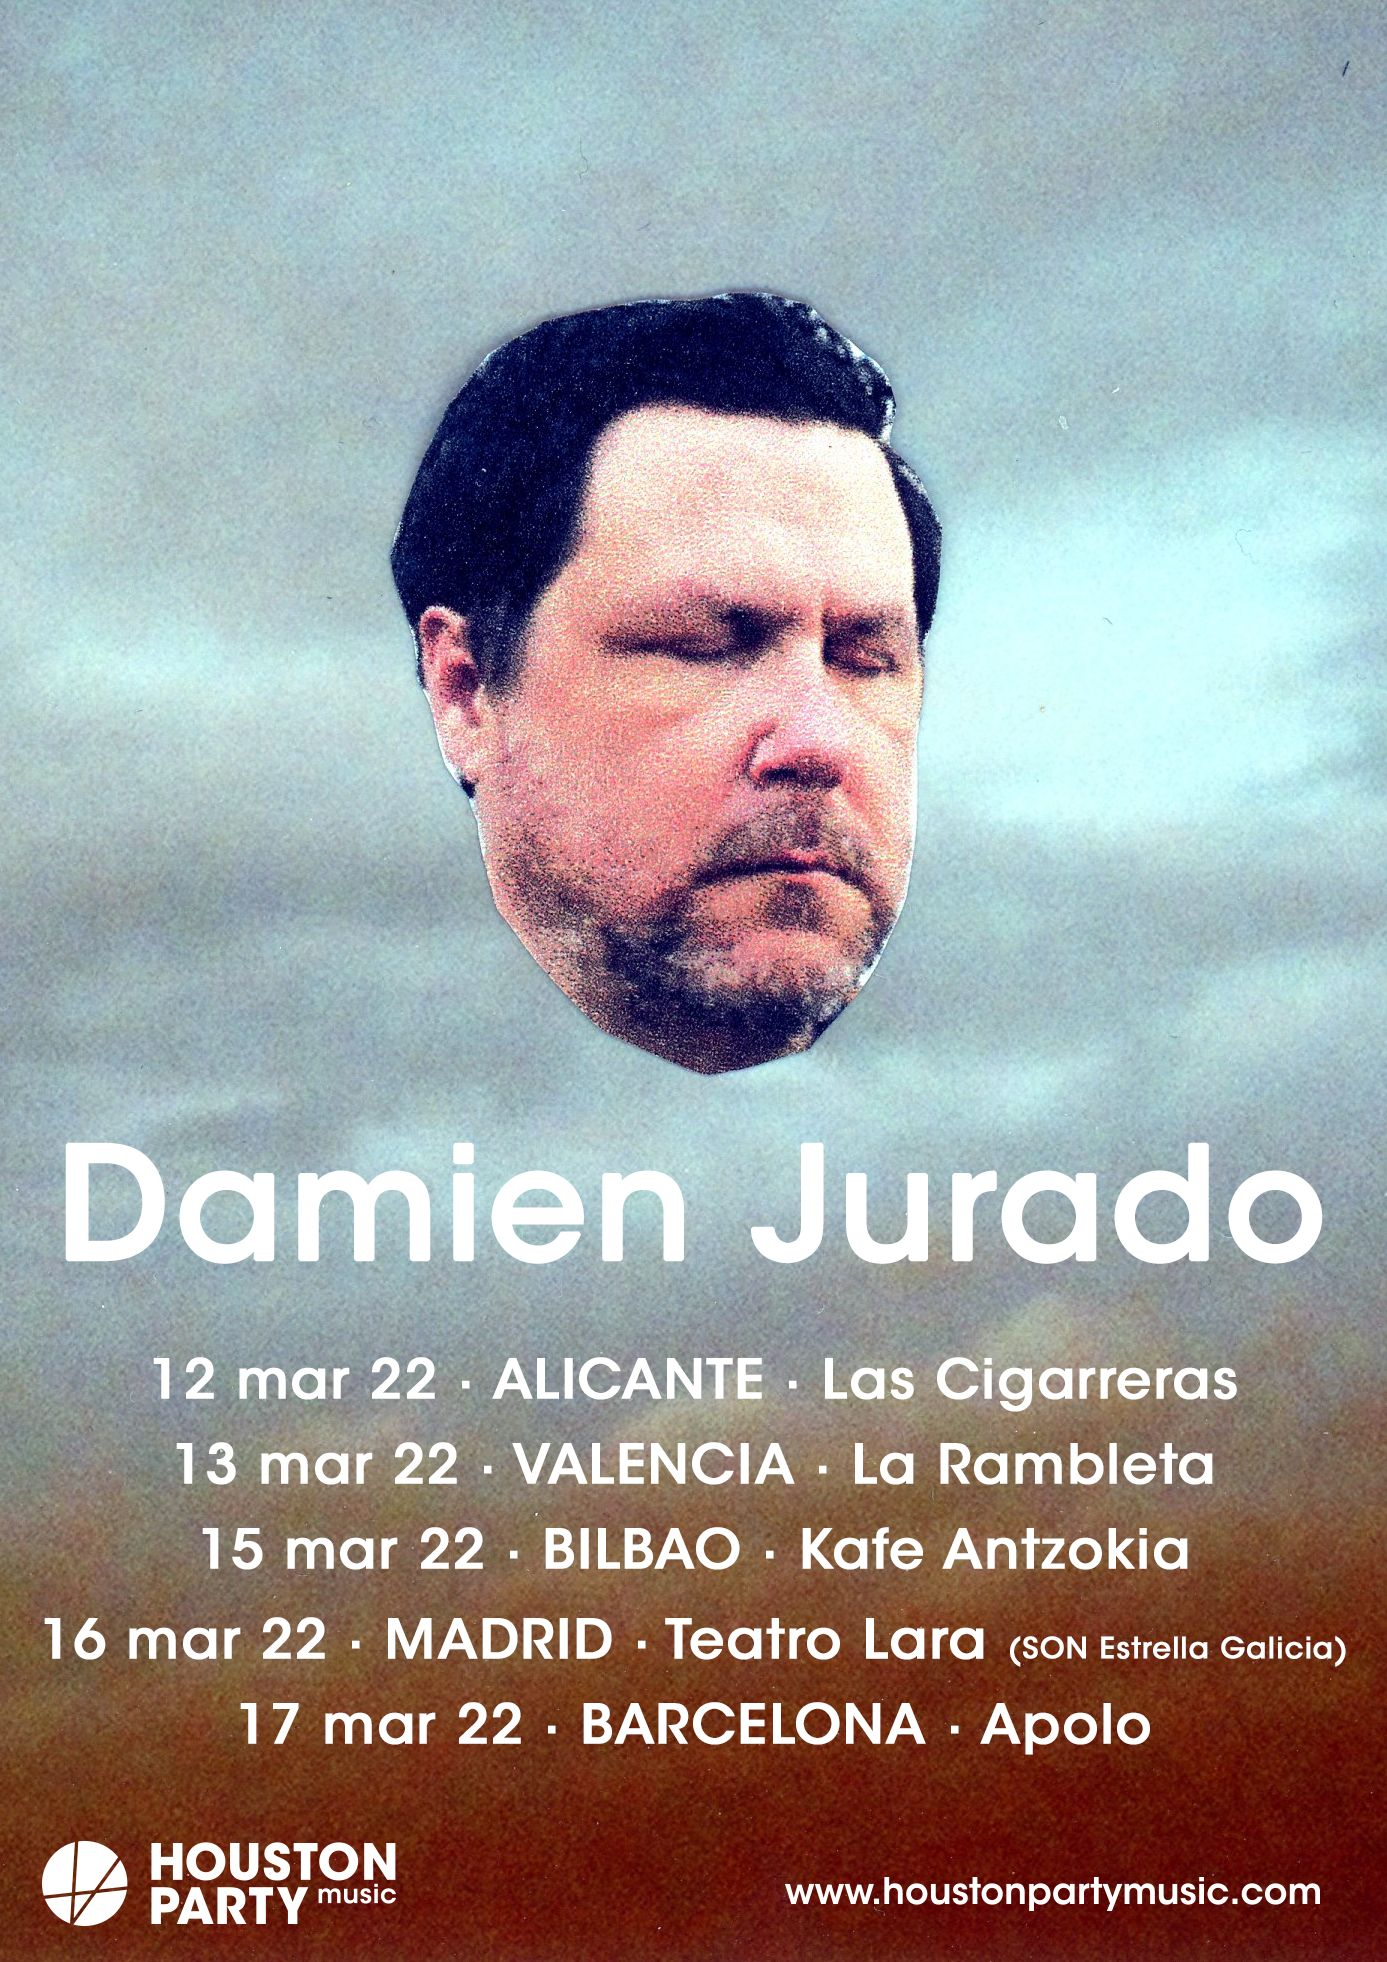 Damien Jurado pospone su gira hasta marzo de 2022